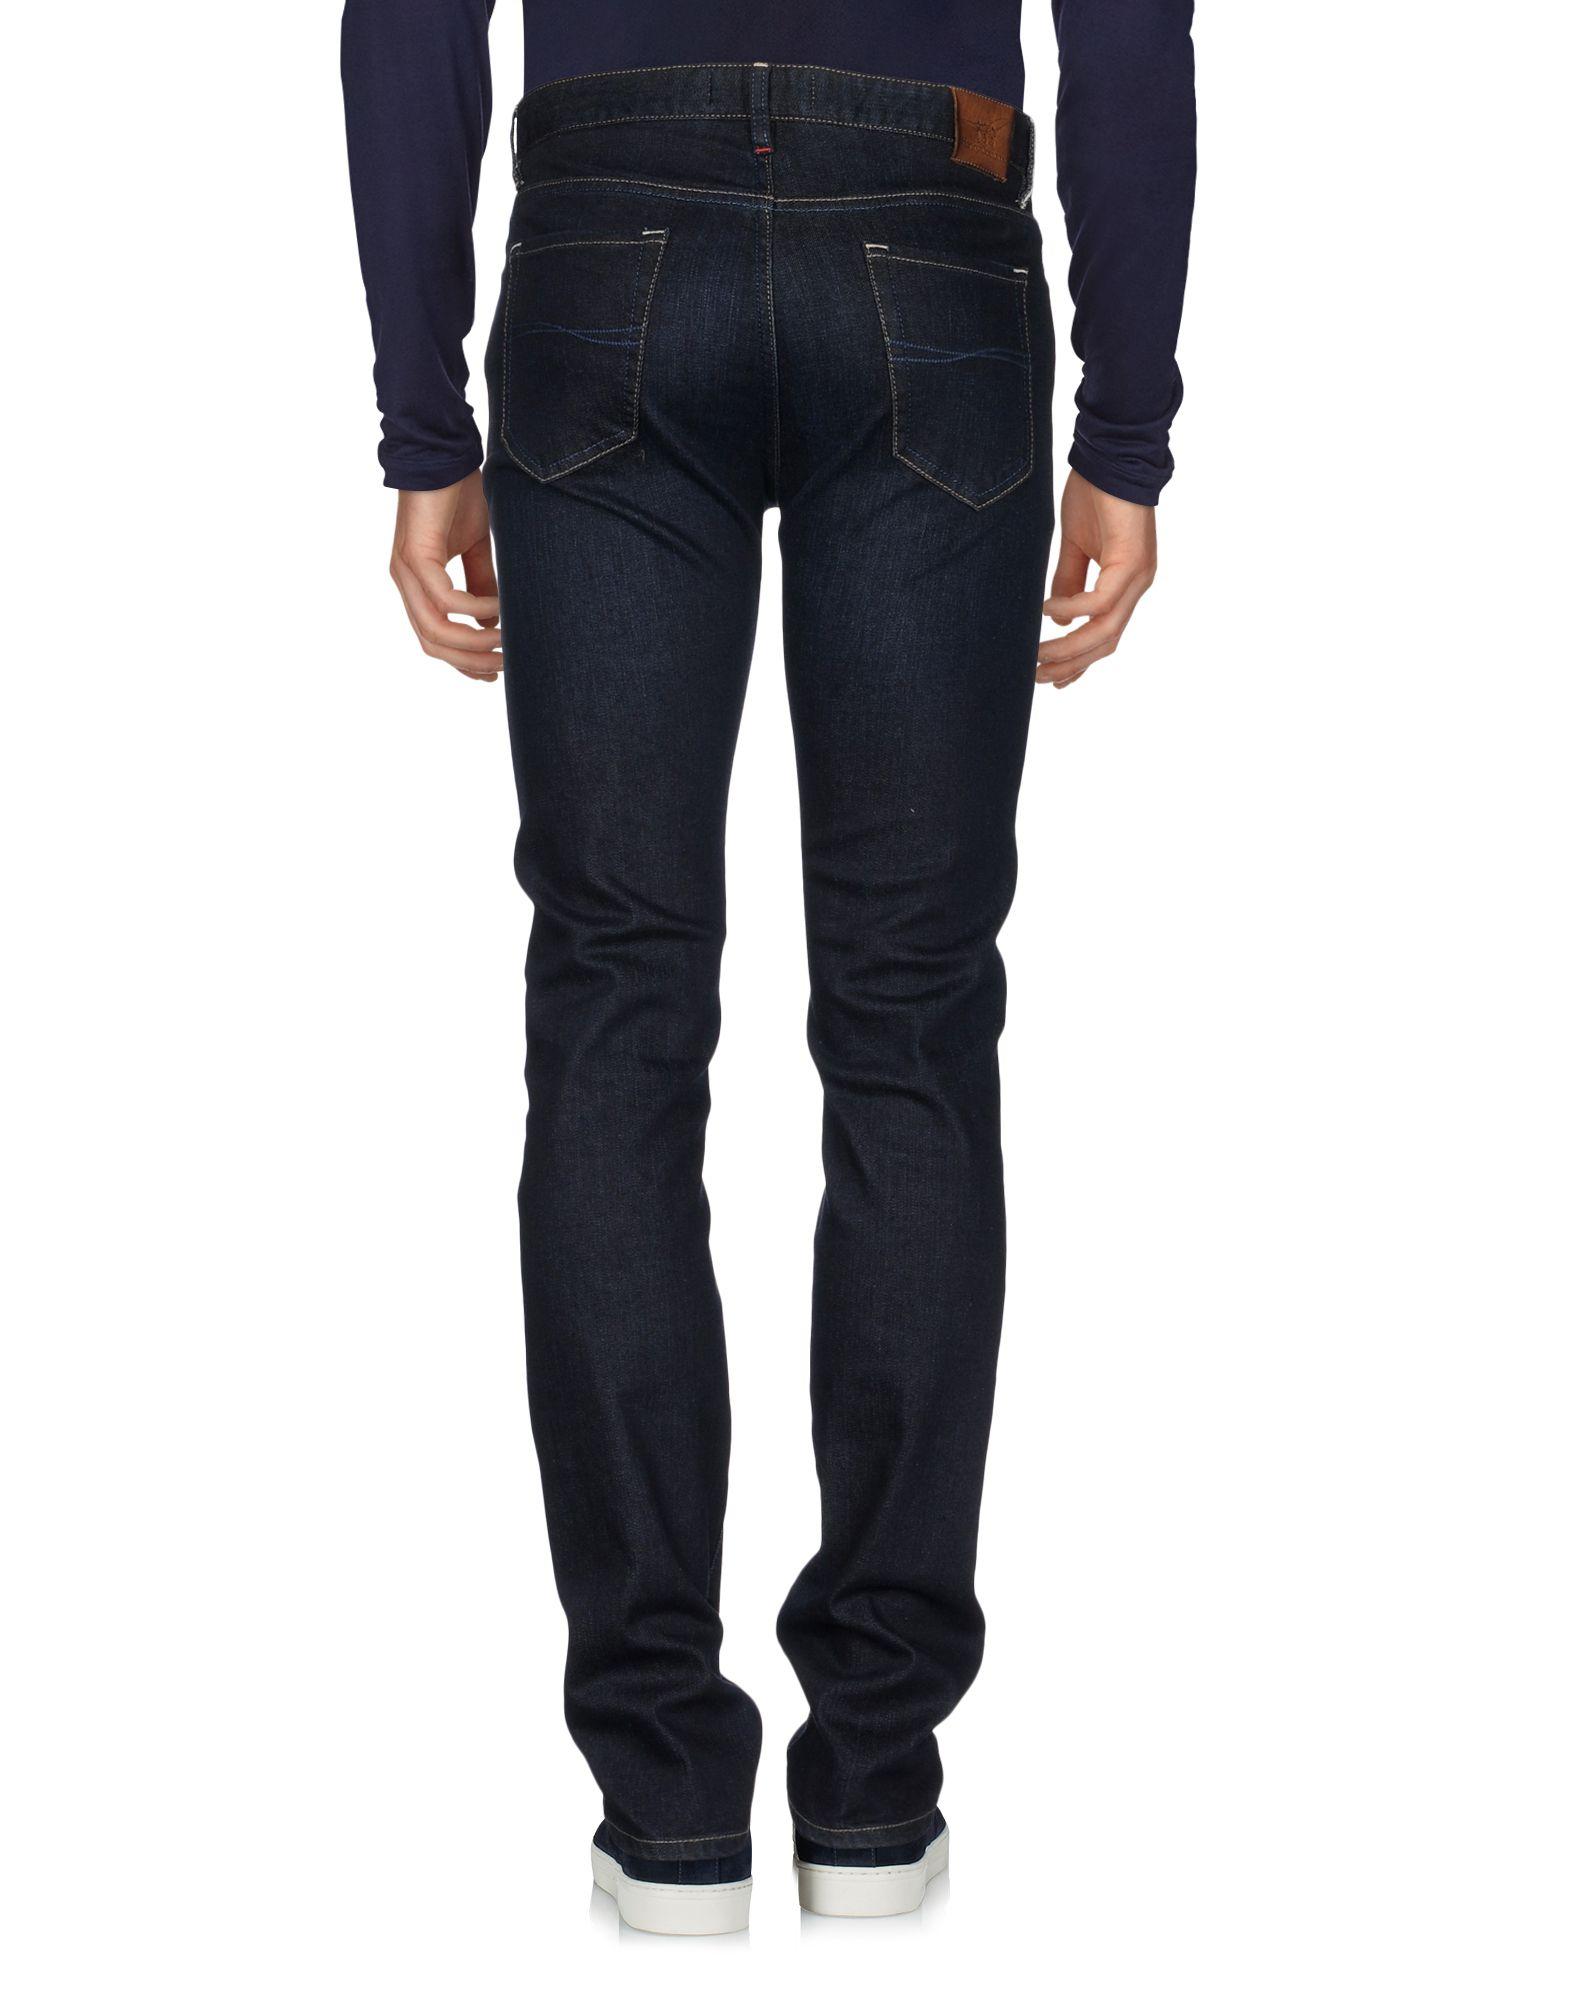 Pantaloni - Jeans Henry Cotton's Uomo - Pantaloni 42682135FR 2c8003